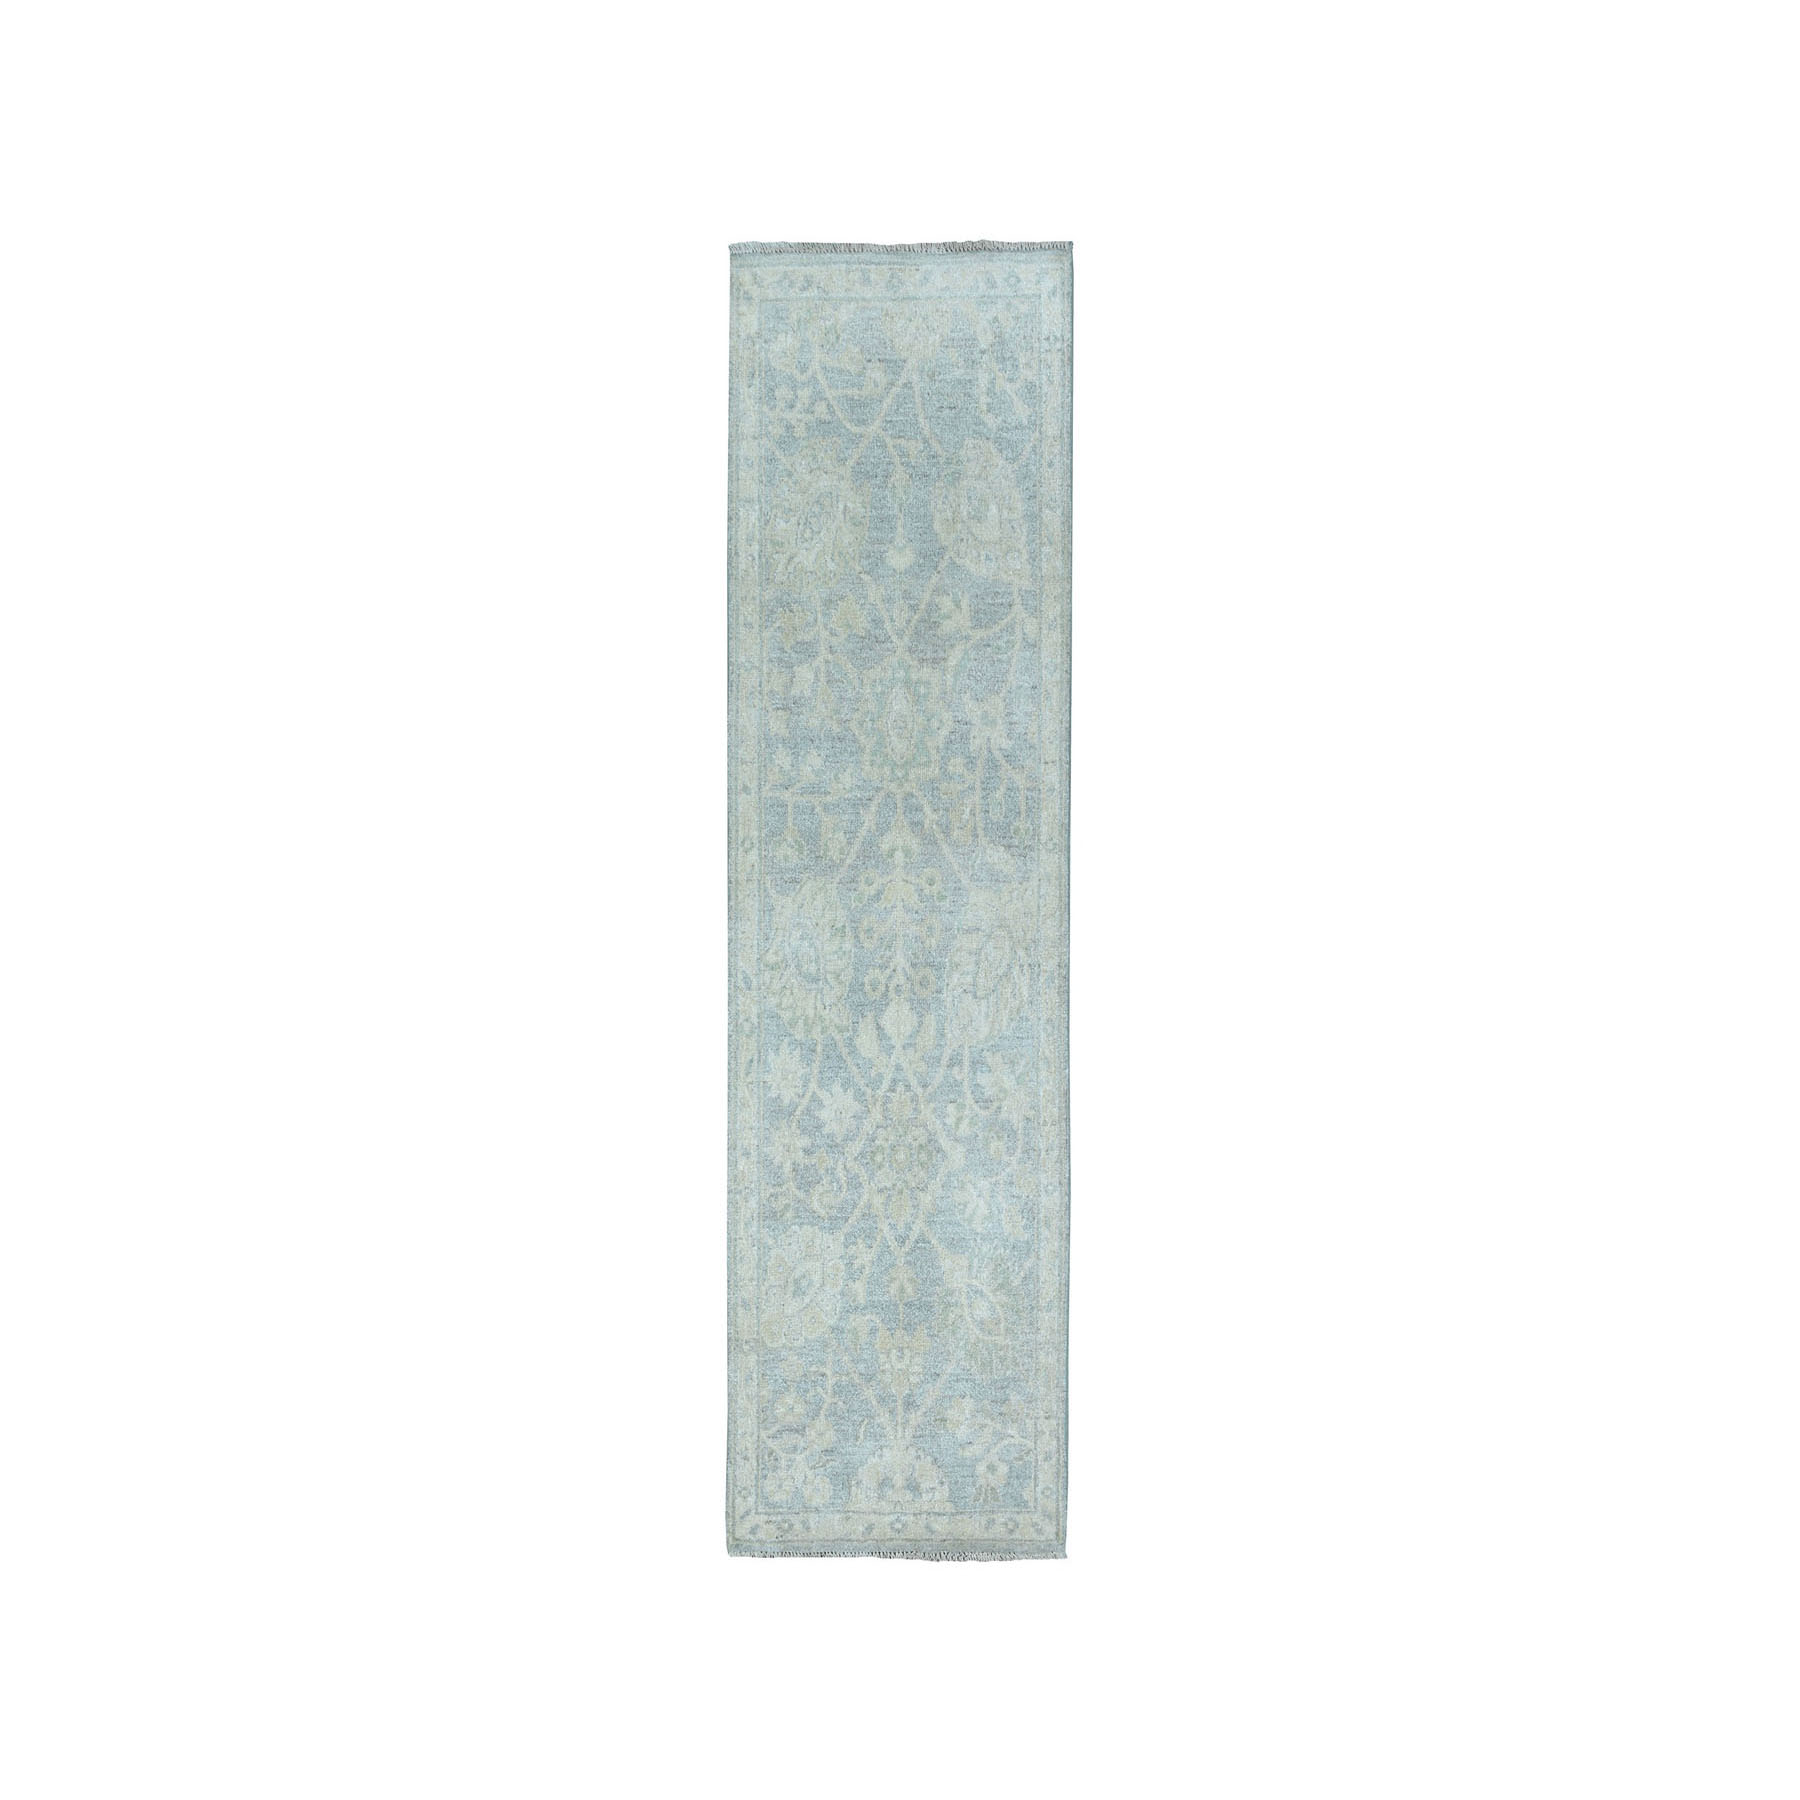 "2'1""X6' White Wash Peshawar Pure Wool Hand-Knotted Oriental  Runner Rug moaea0de"